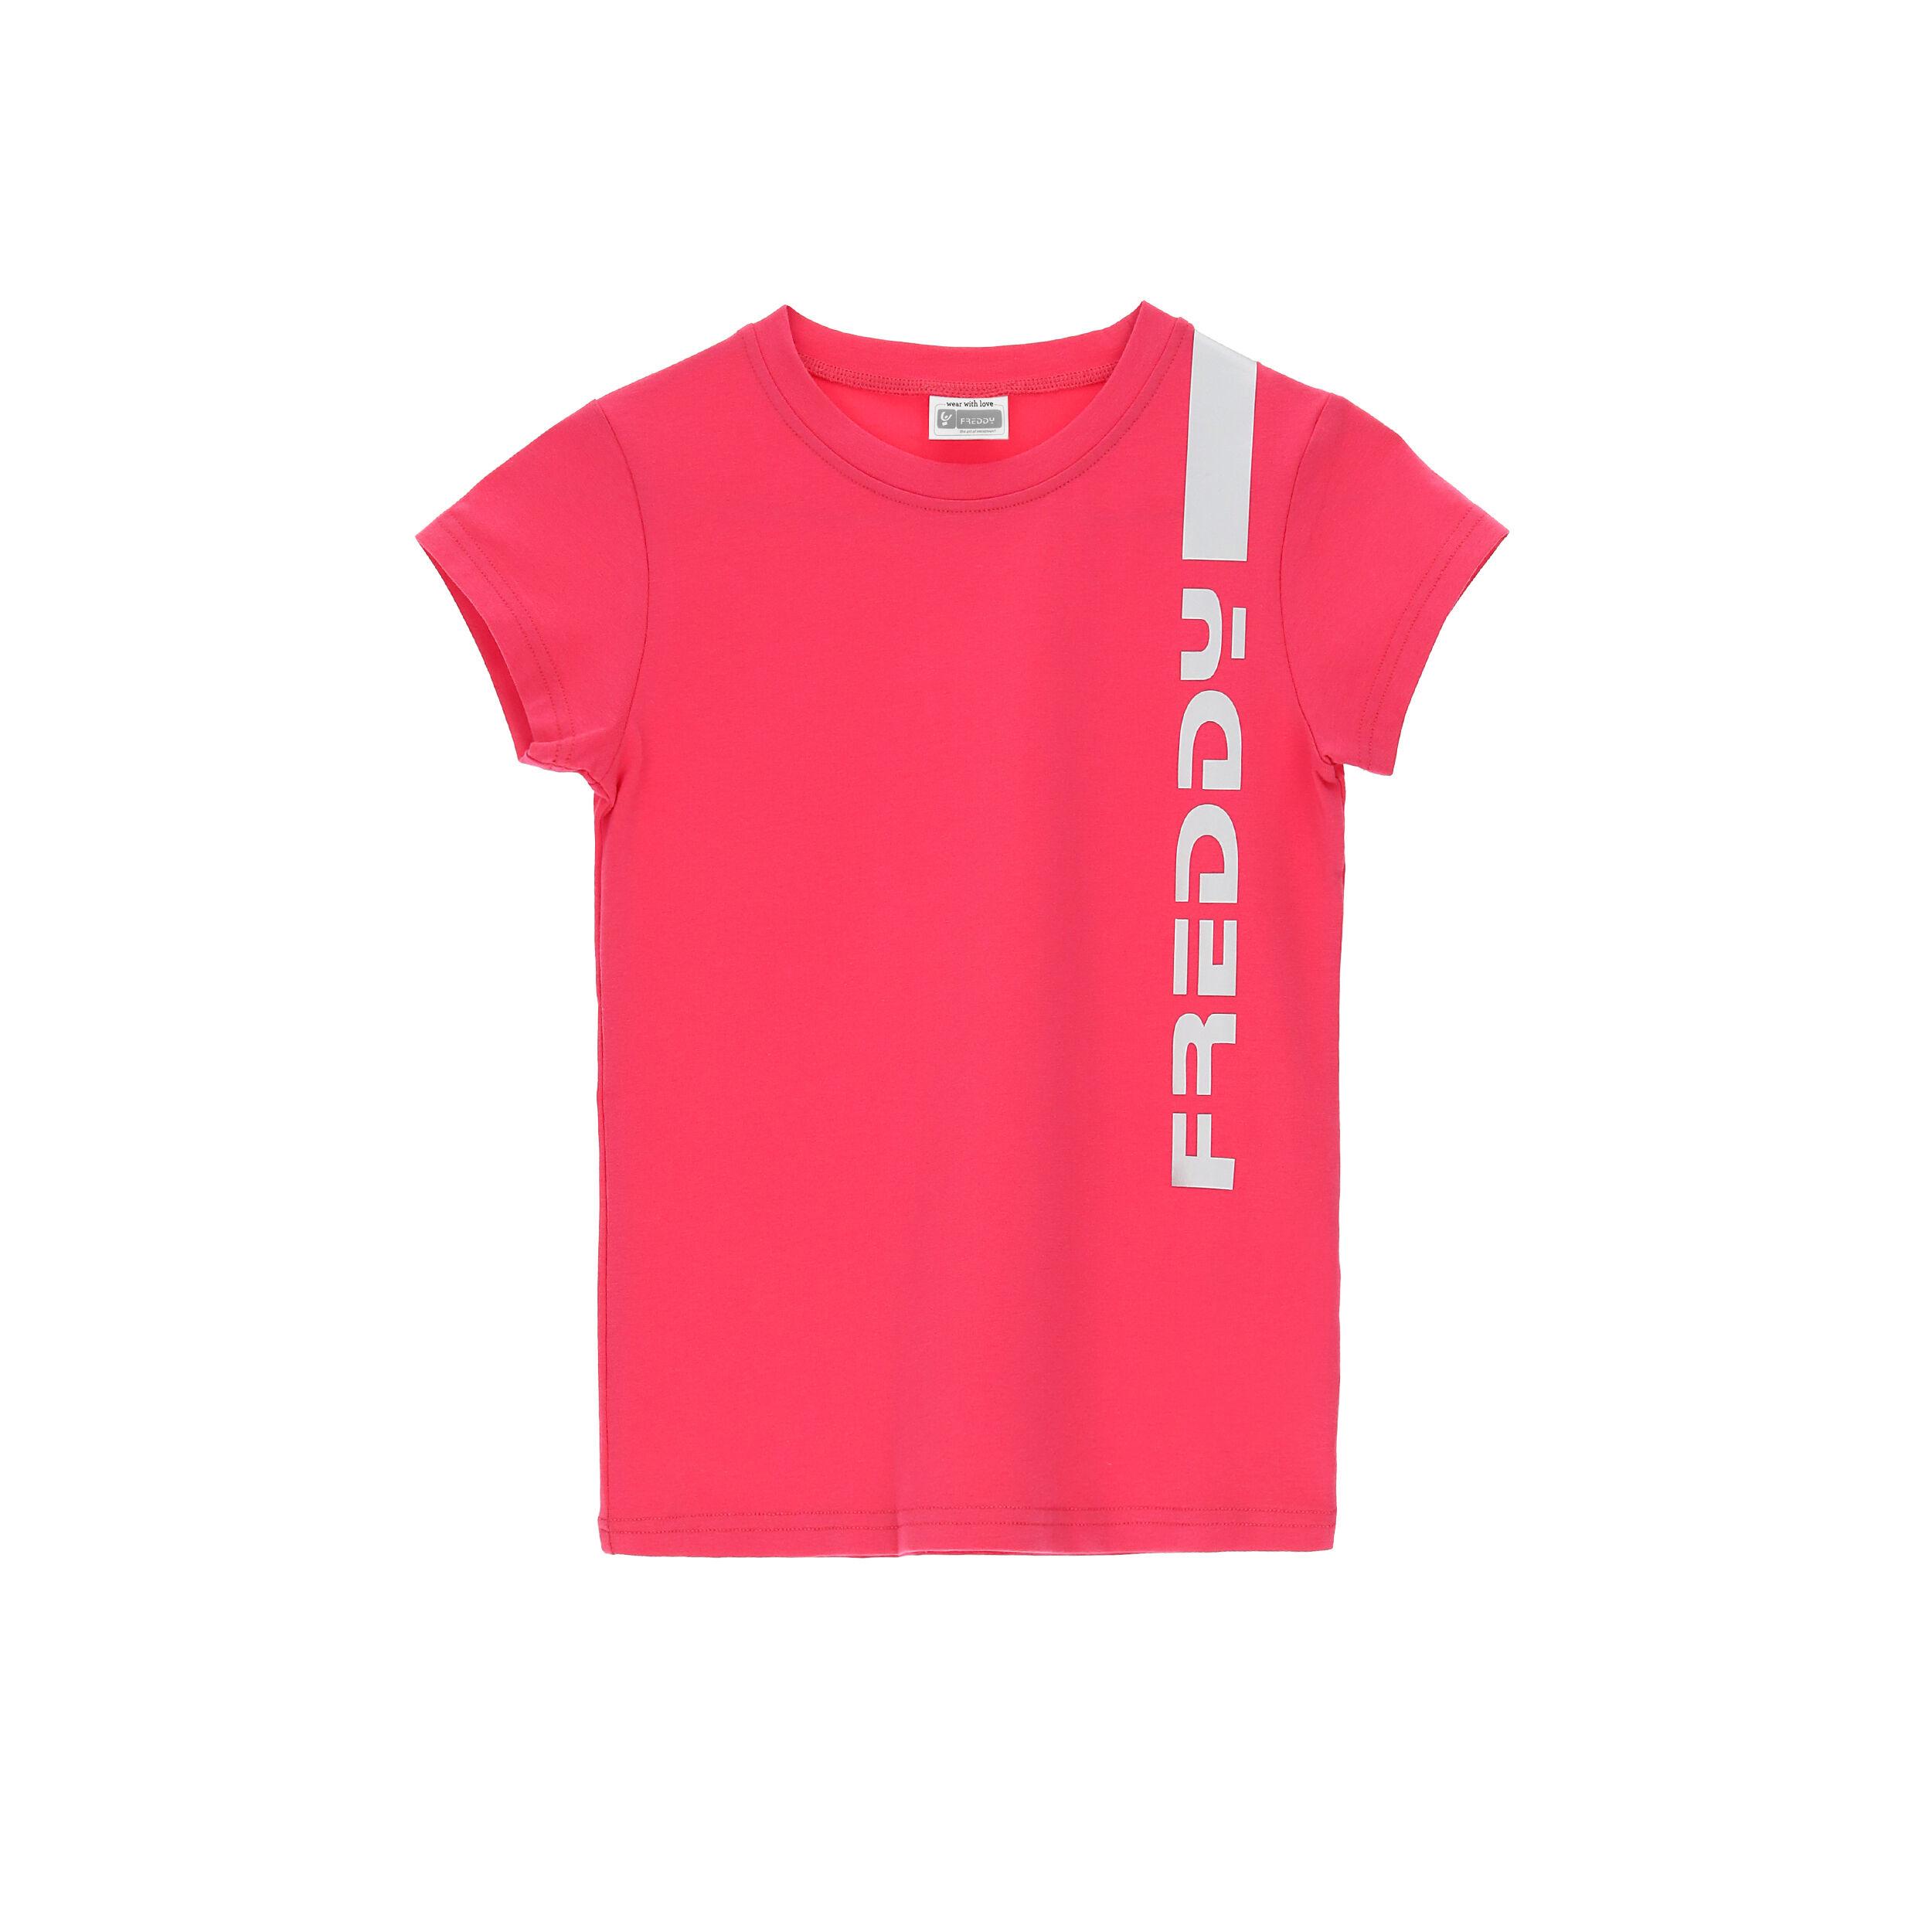 Freddy T-shirt stampa  verticale reflex - Ragazza 10-16 Fuxia